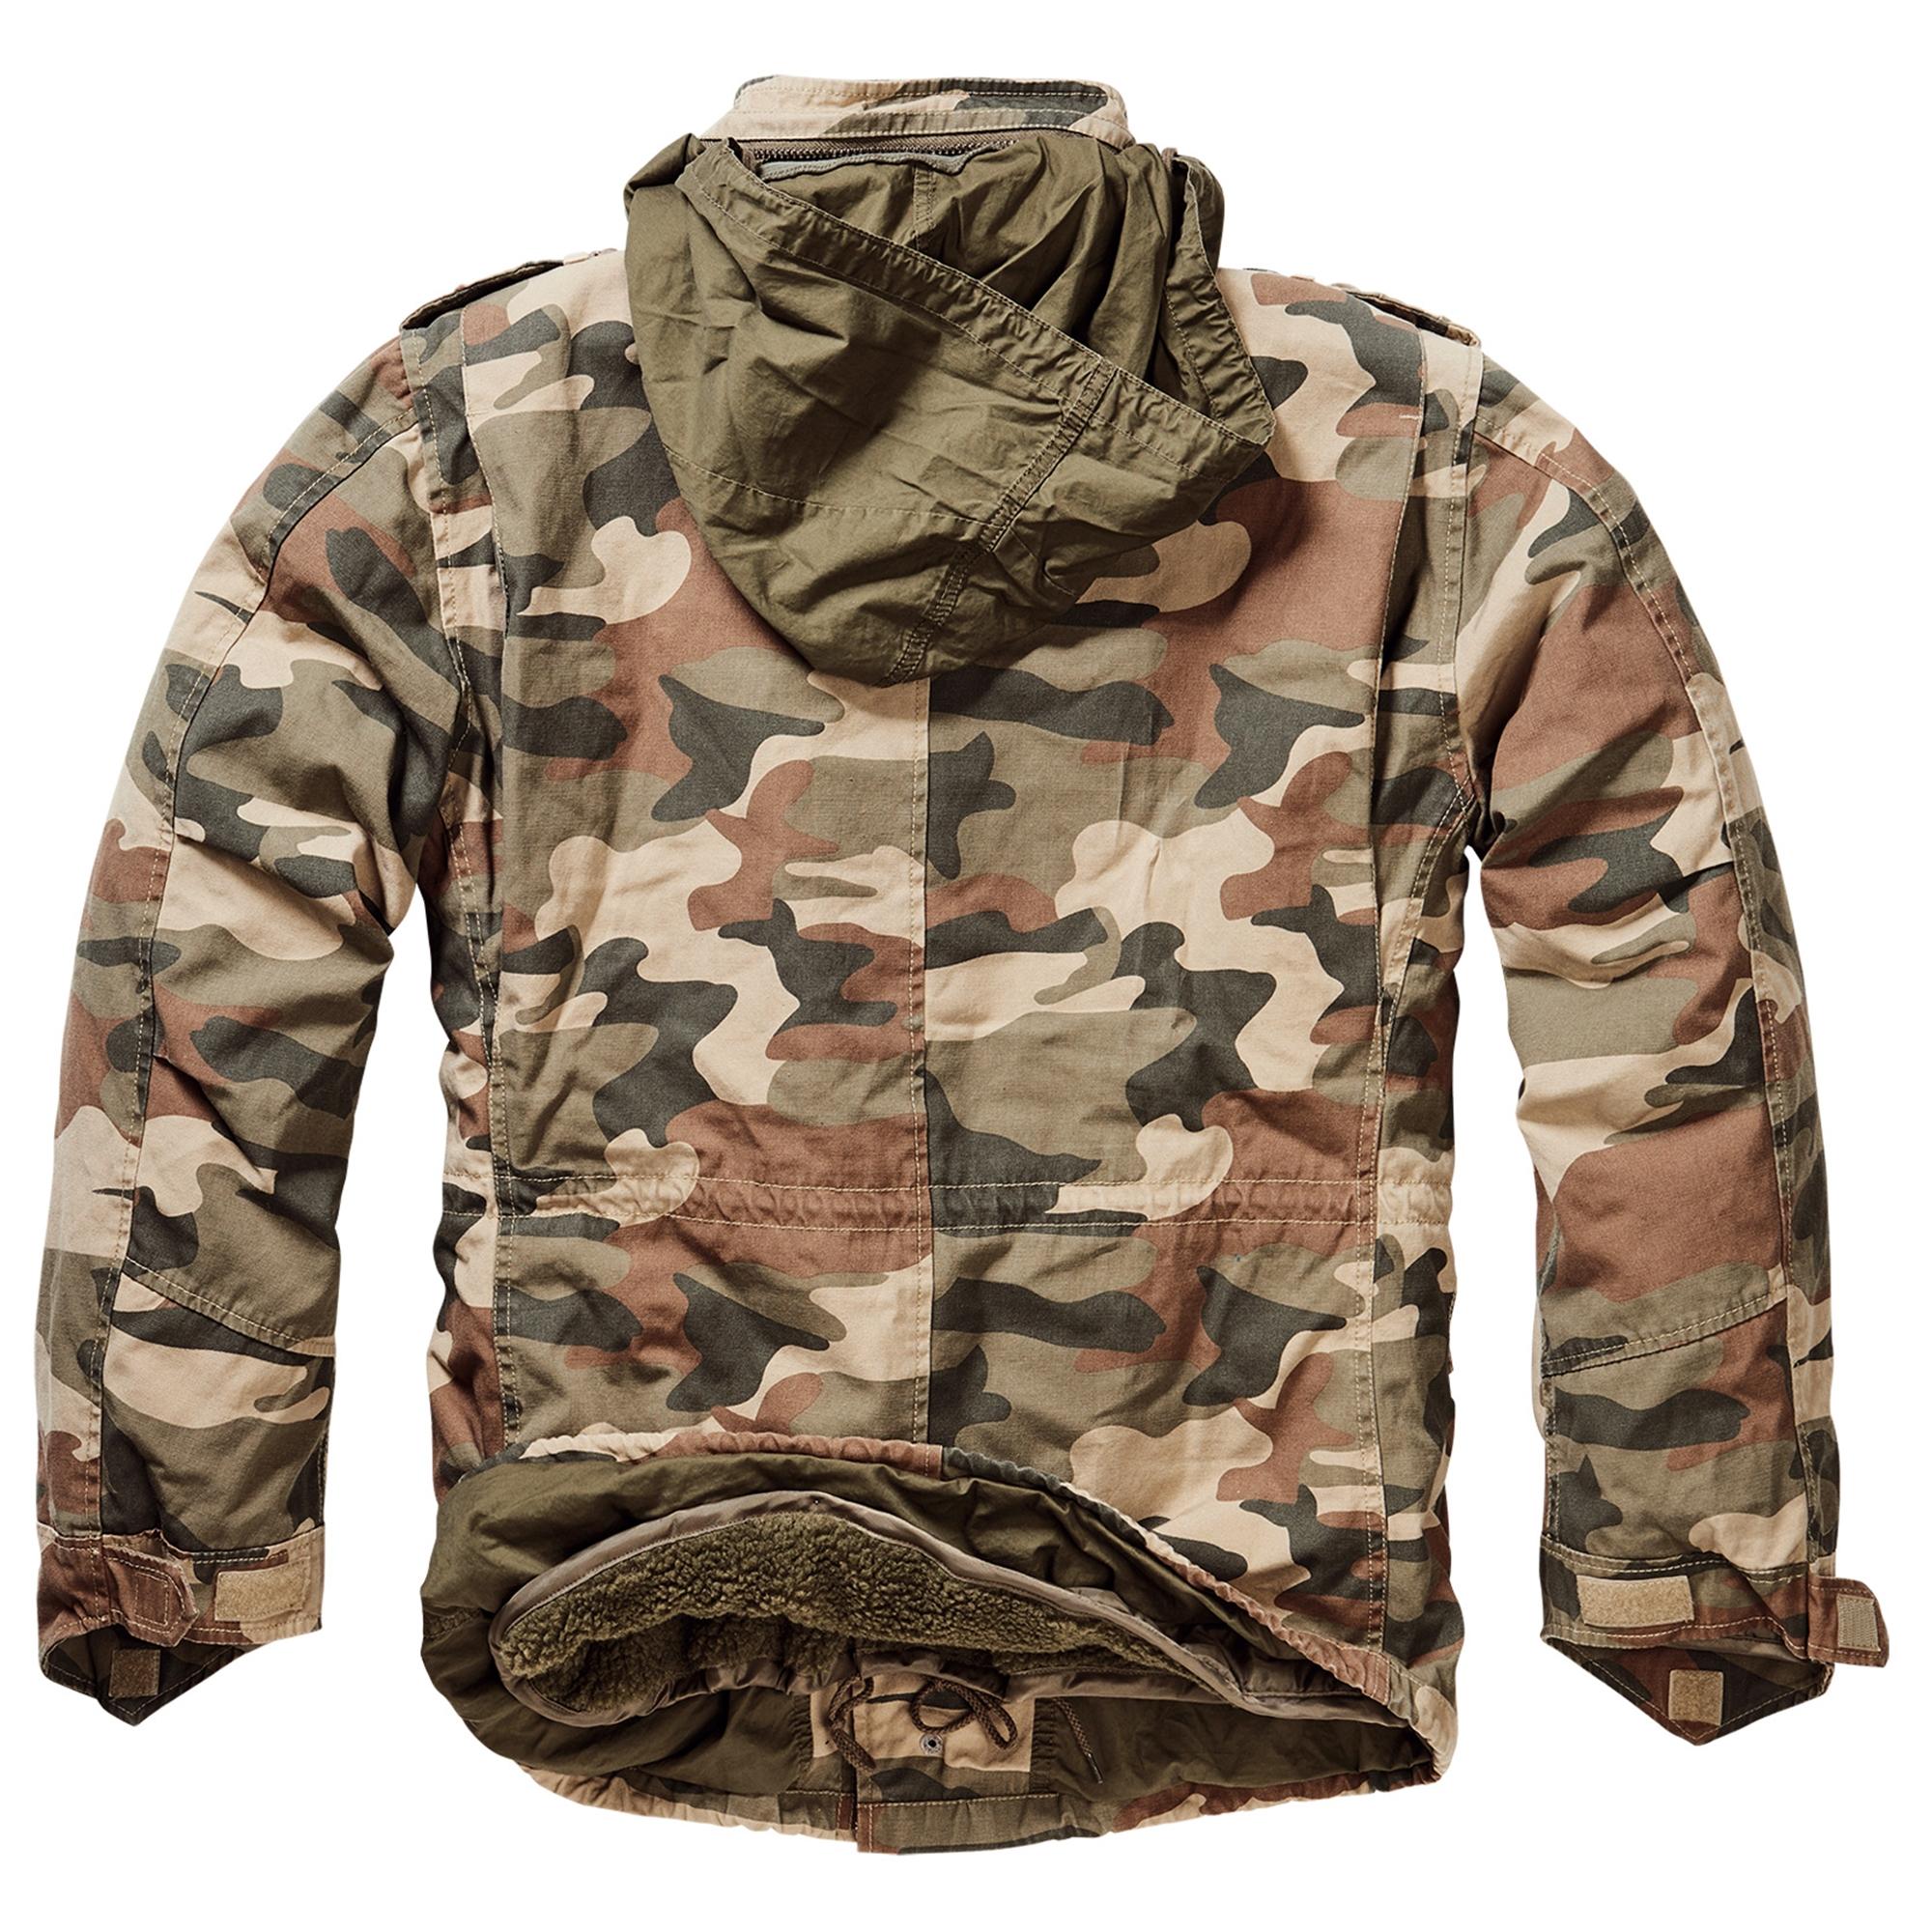 Brandit-M65-Giant-Herren-Jacke-Vintage-Feldjacke-Army-Outdoor-Parka-Futter-S-7XL Indexbild 21